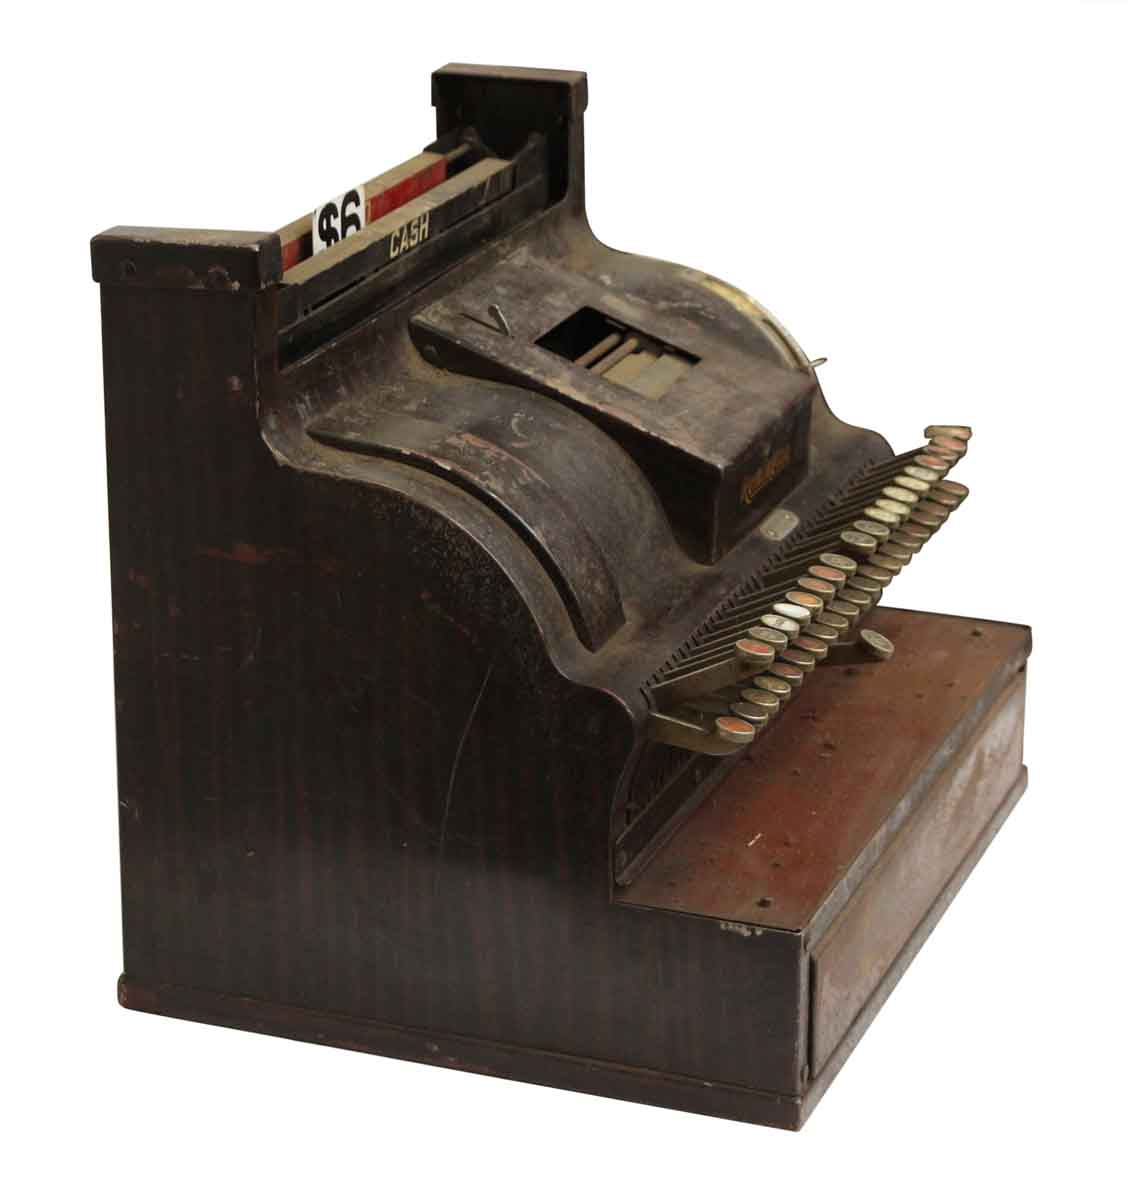 Olde Remington Cash Register | Olde Good Things